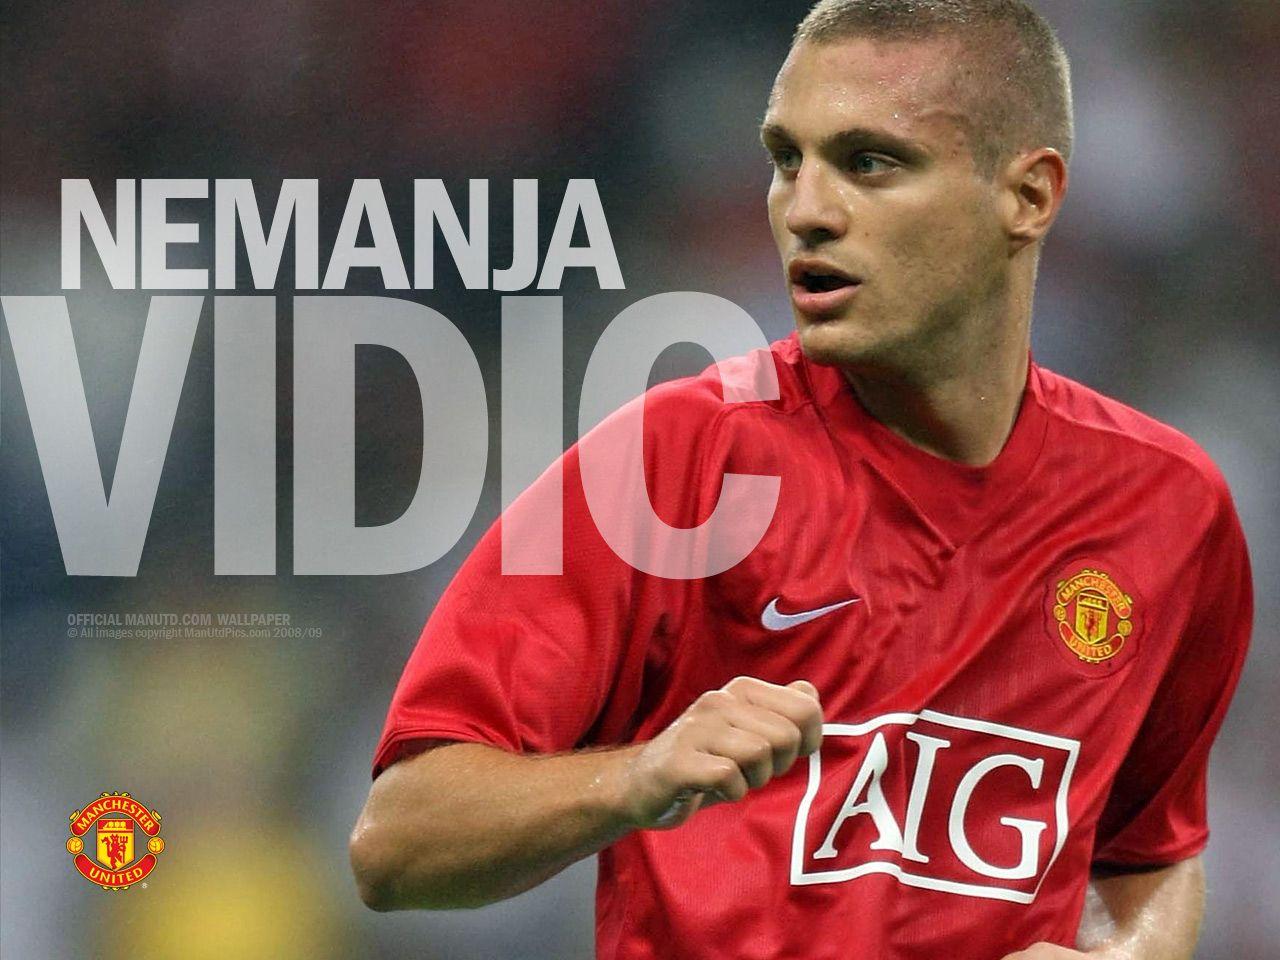 Download Football Wallpaper: Nemanja Vidić